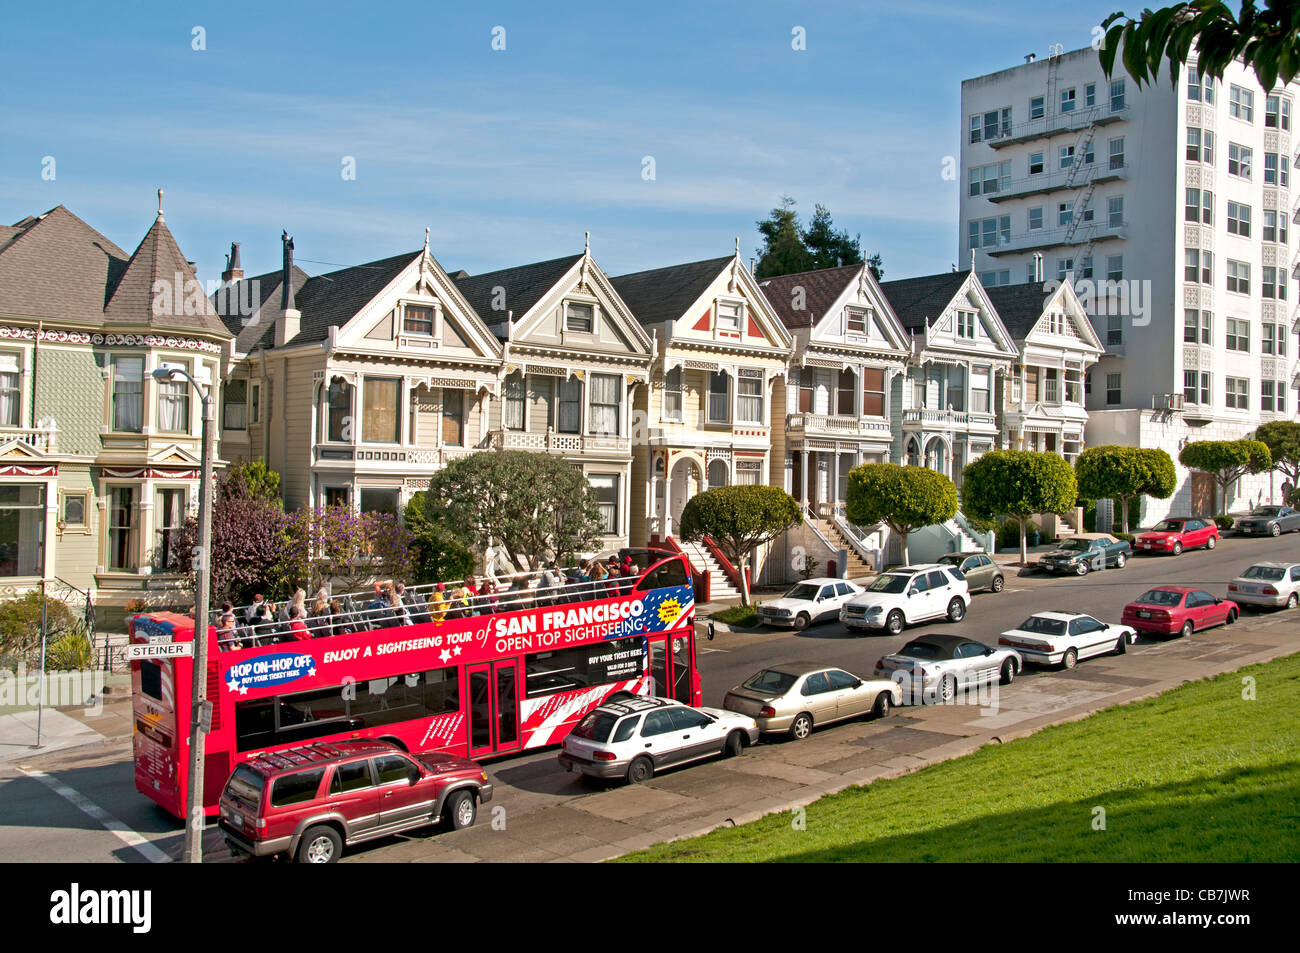 San Francisco Alamo Square Haight  Ashbury California United States - Stock Image